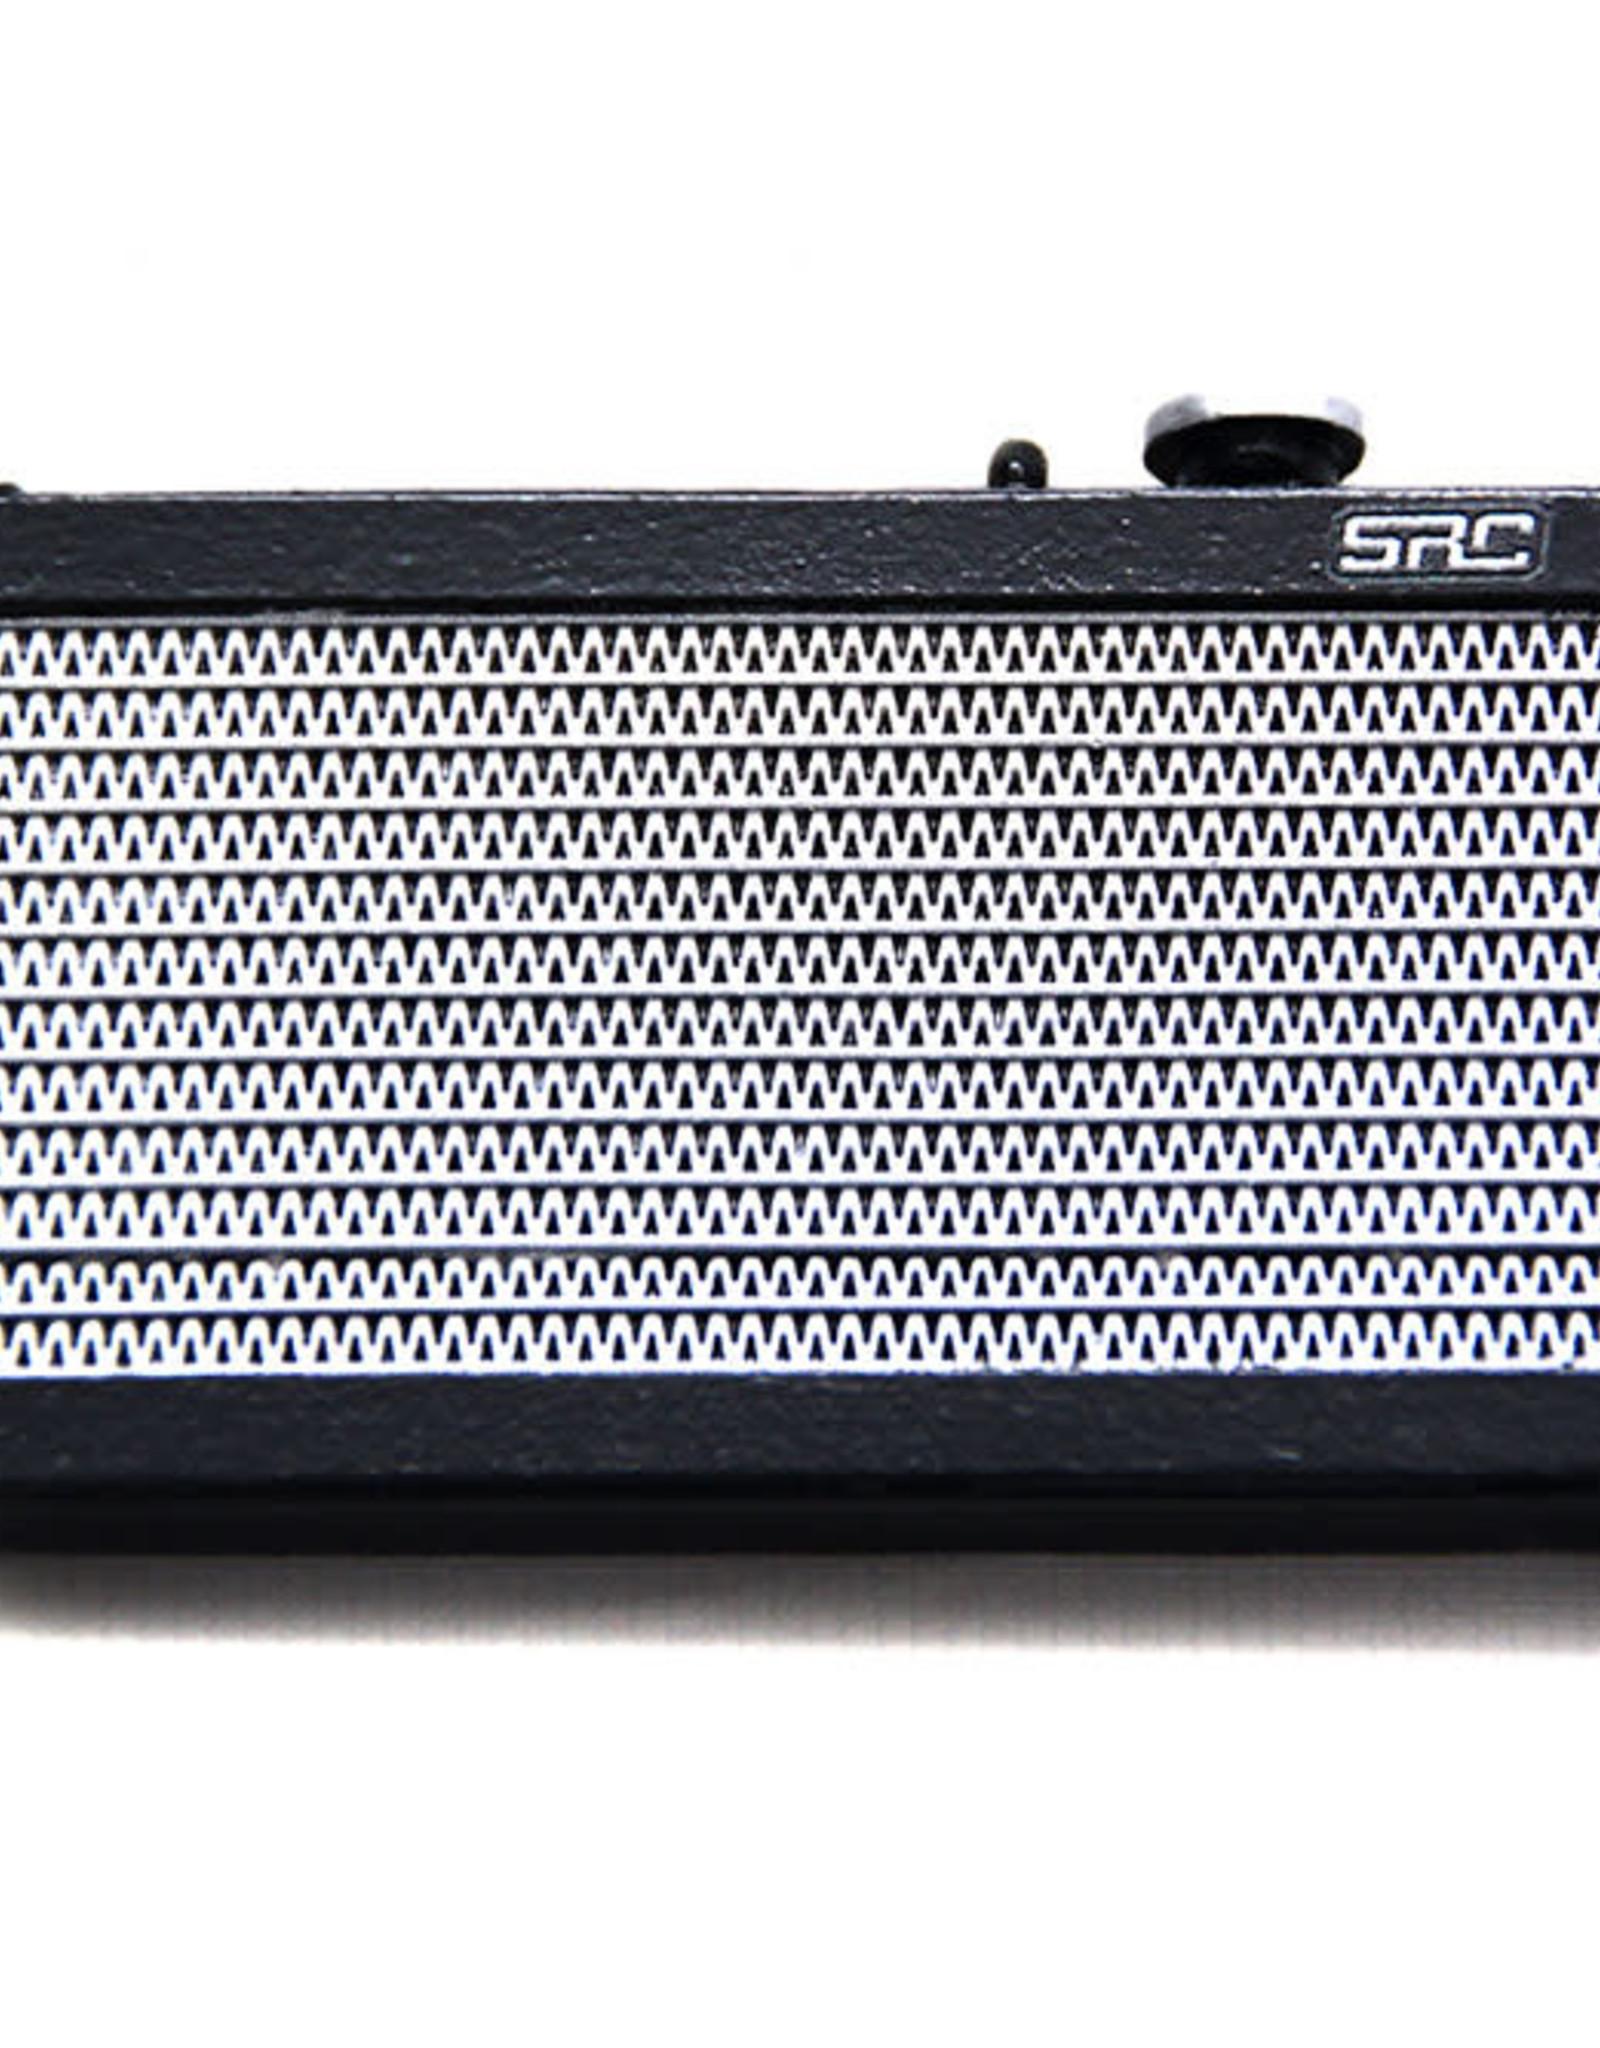 SRC SRC RADIATOR 1